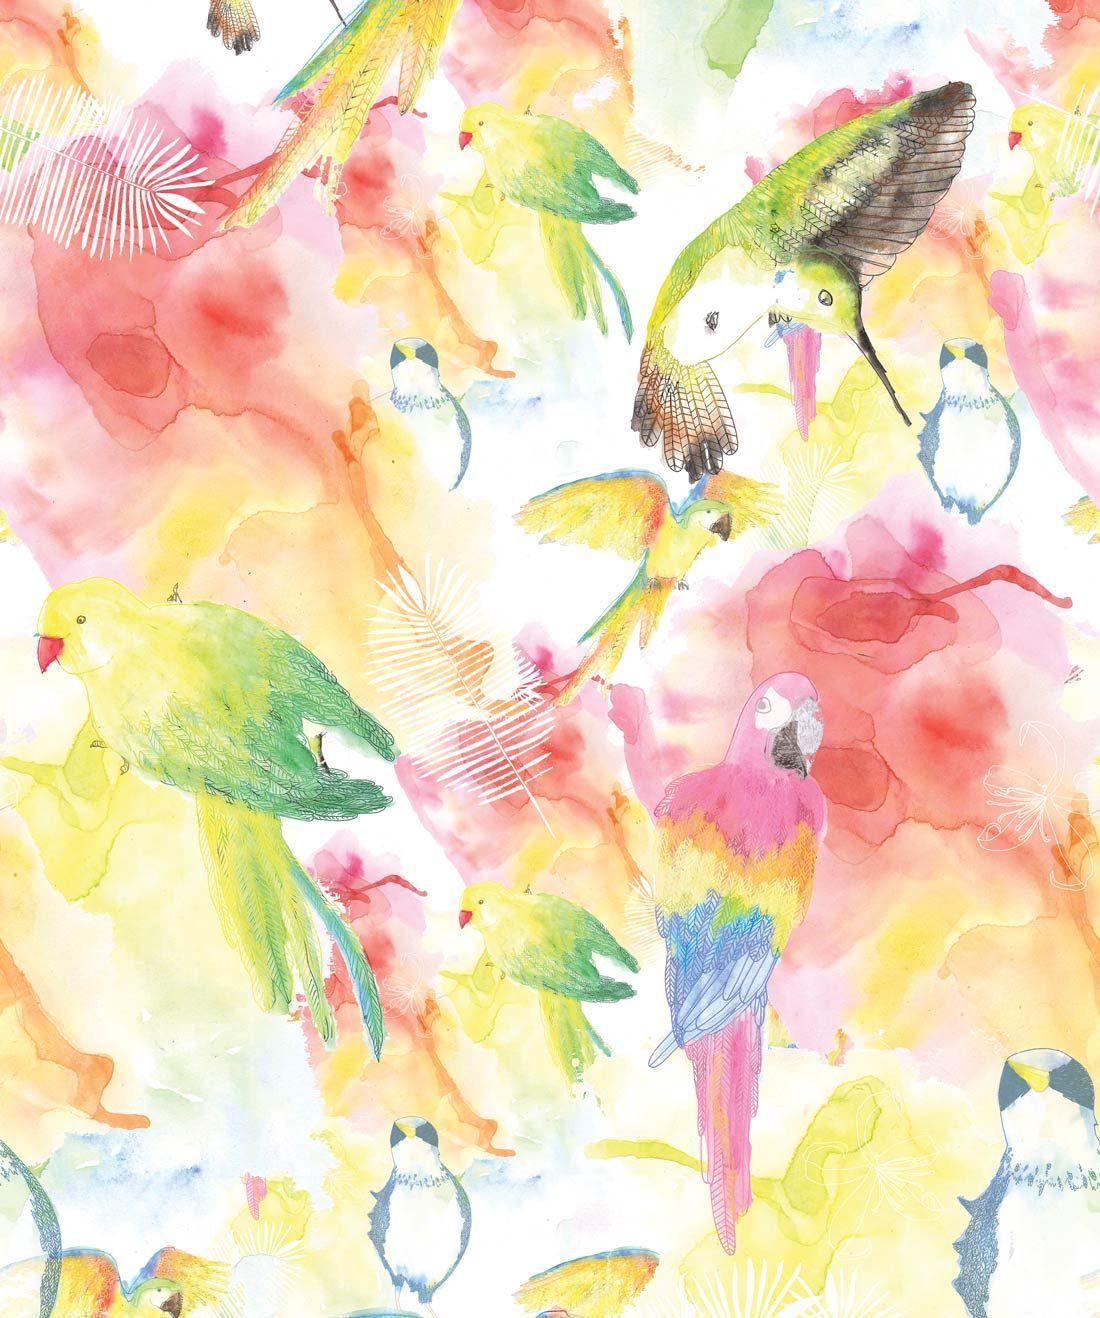 Watercolor Birds The Ultimate Tropical Bird Wallpaper In 2020 Watercolor Bird Watercolor Wallpaper Bird Wallpaper